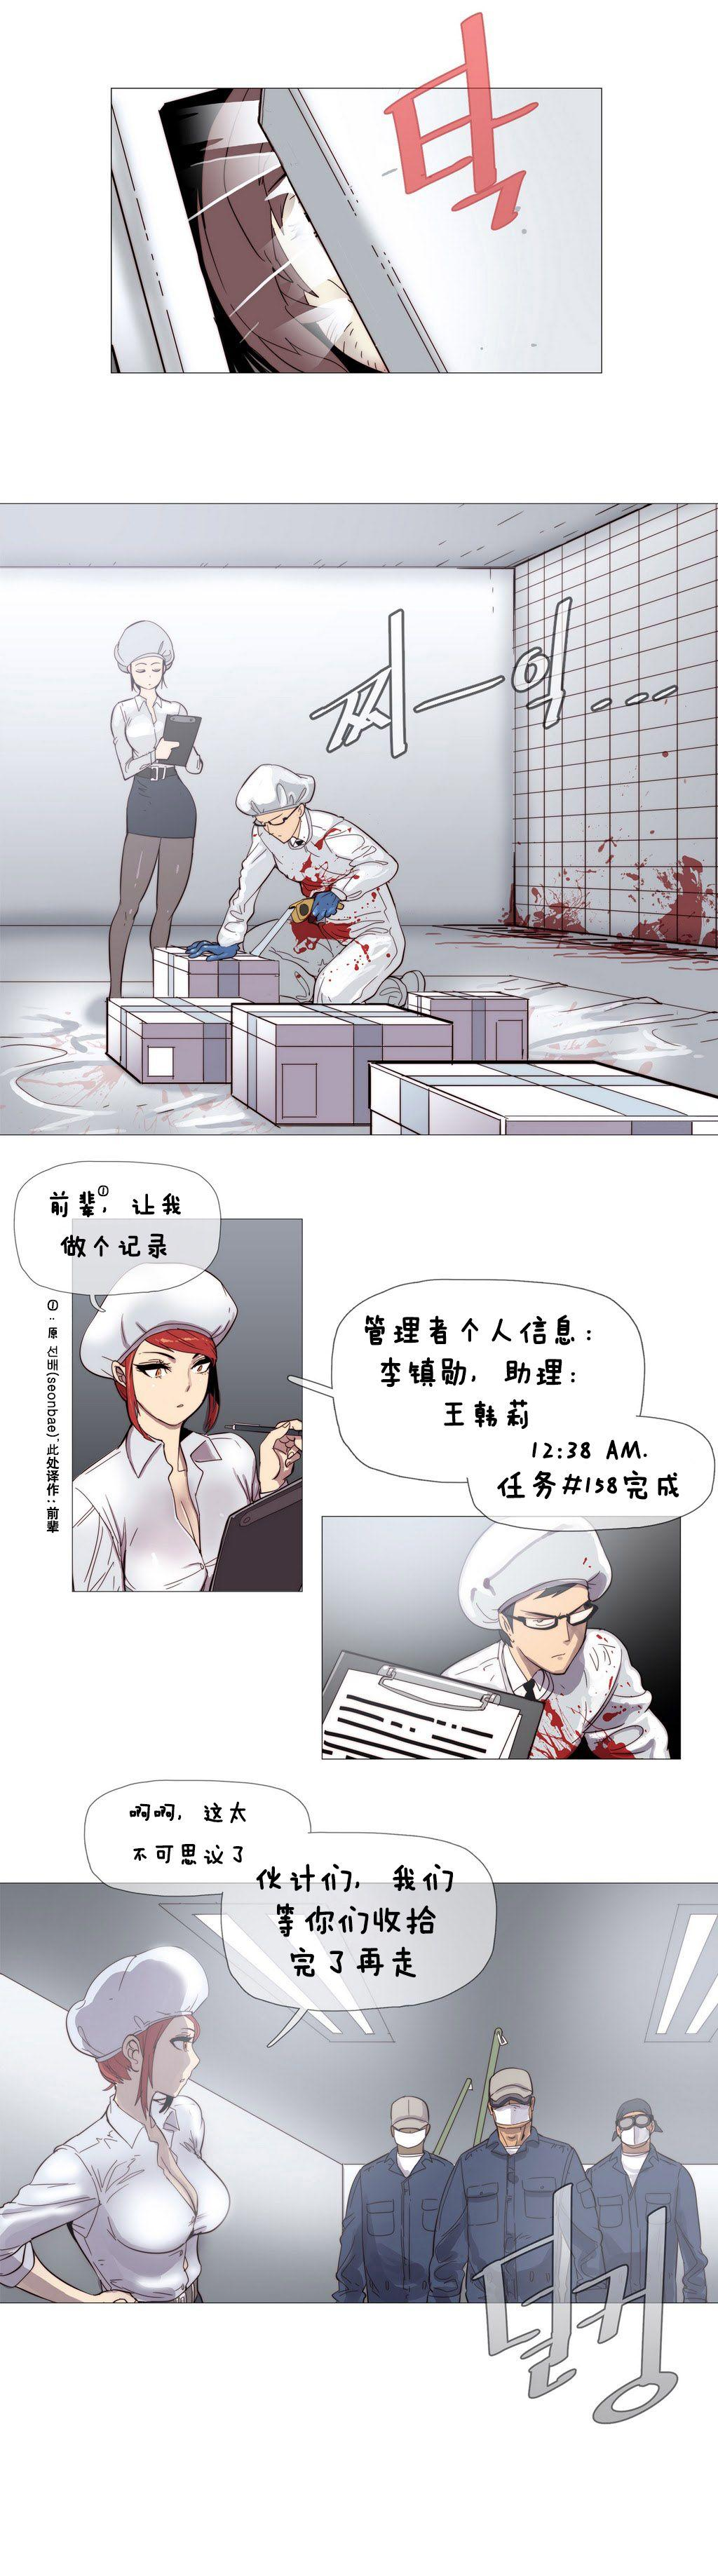 HouseHold Affairs 【卞赤鲤个人汉化】1~33话(持续更新中) 43